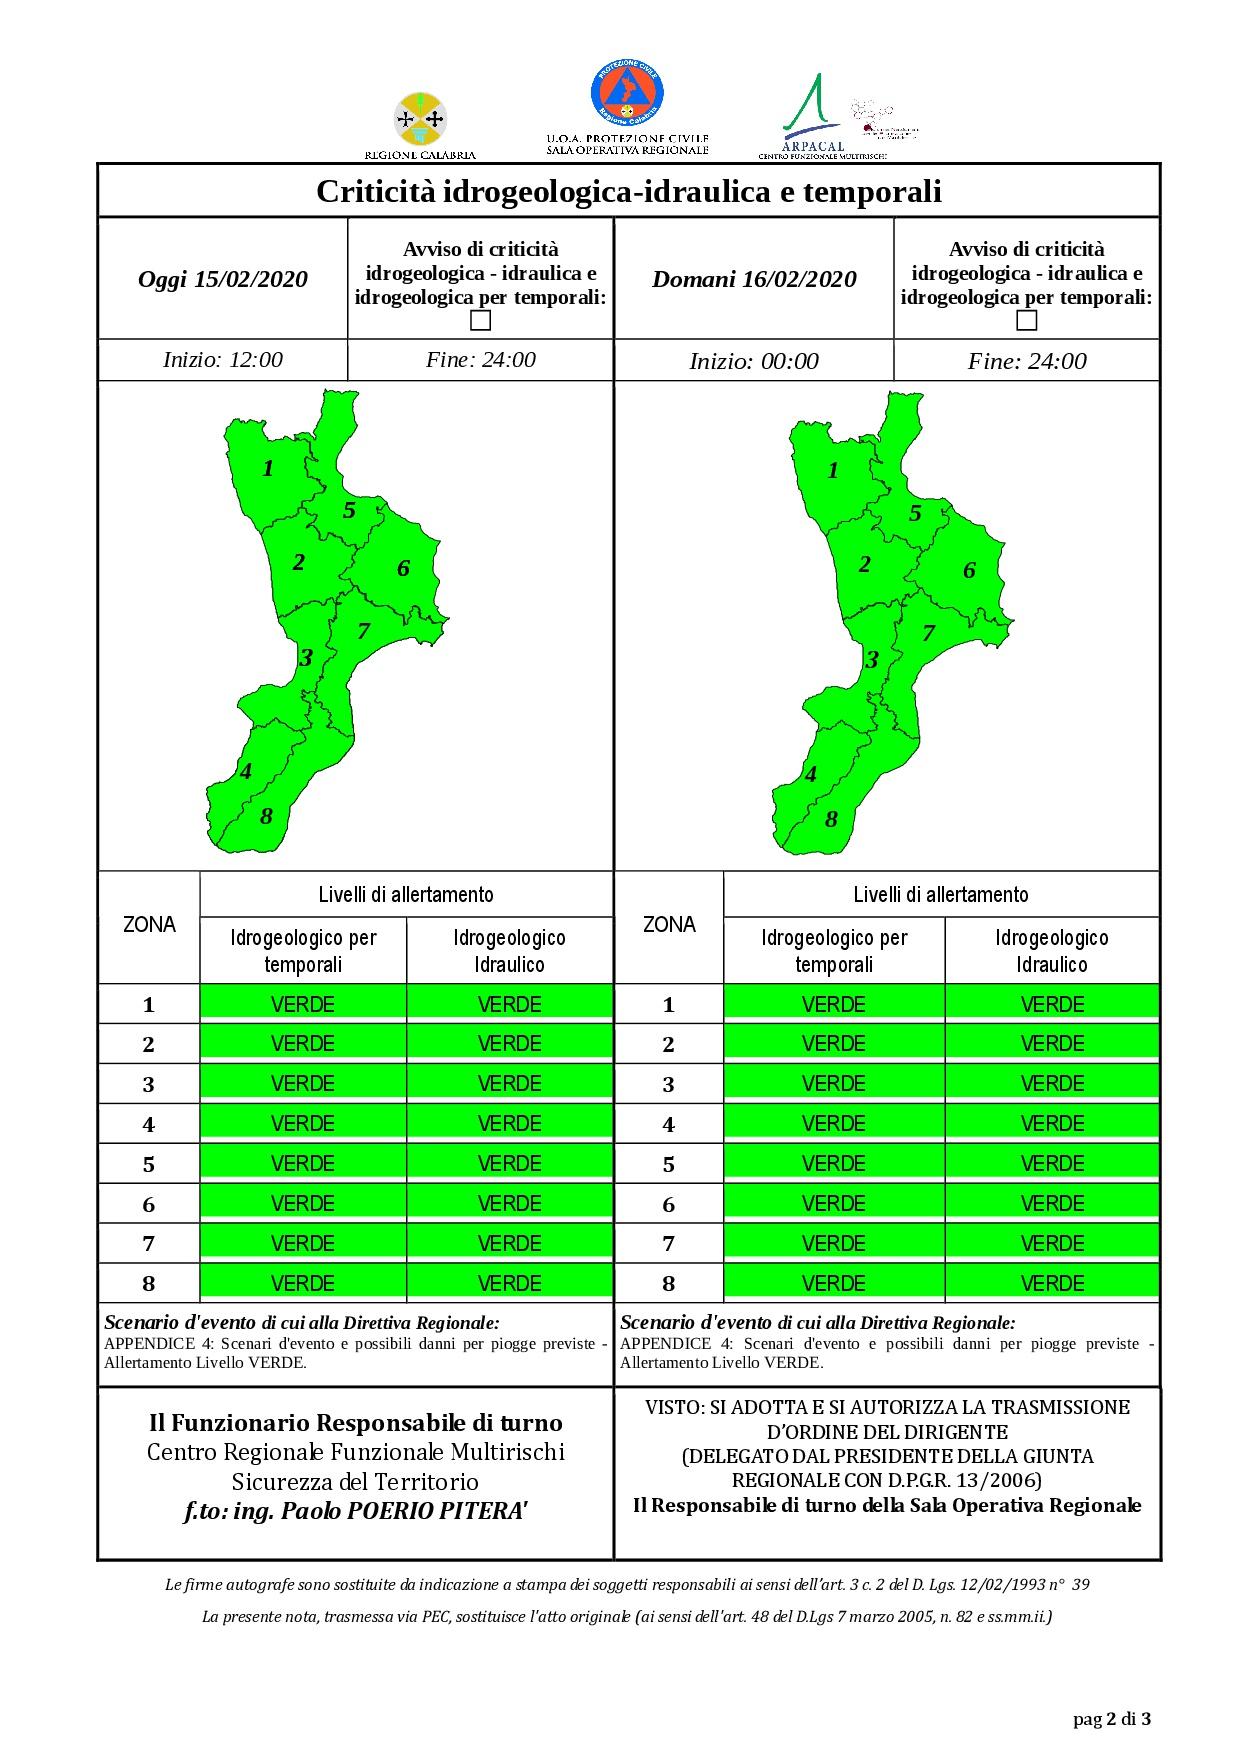 Criticità idrogeologica-idraulica e temporali in Calabria 15-02-2020